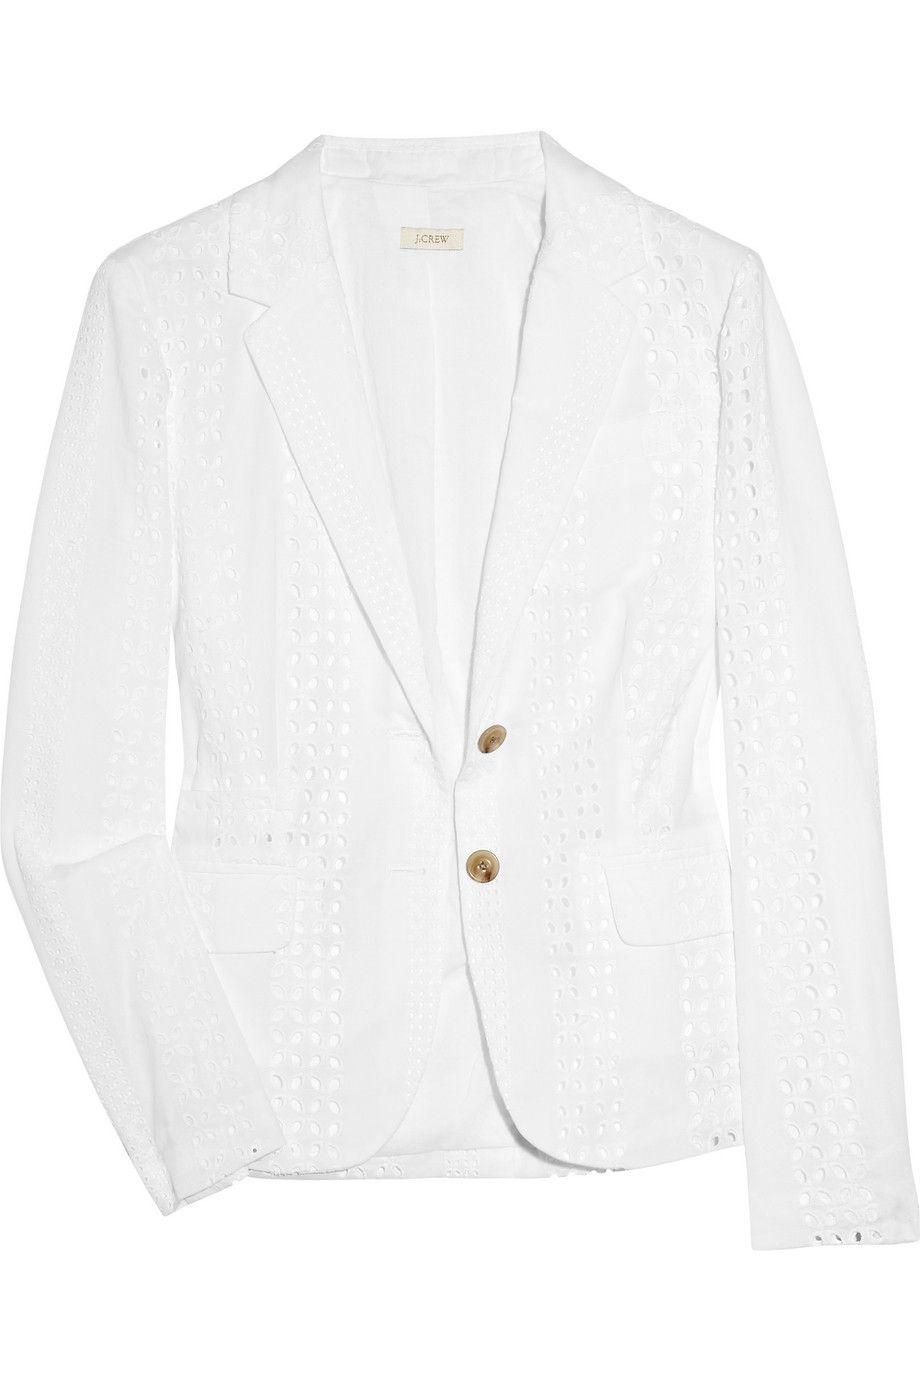 126face6c0 J.CREW - Broderie anglaise cotton blazer. Eyelet fabric, perfect summer  blazer.